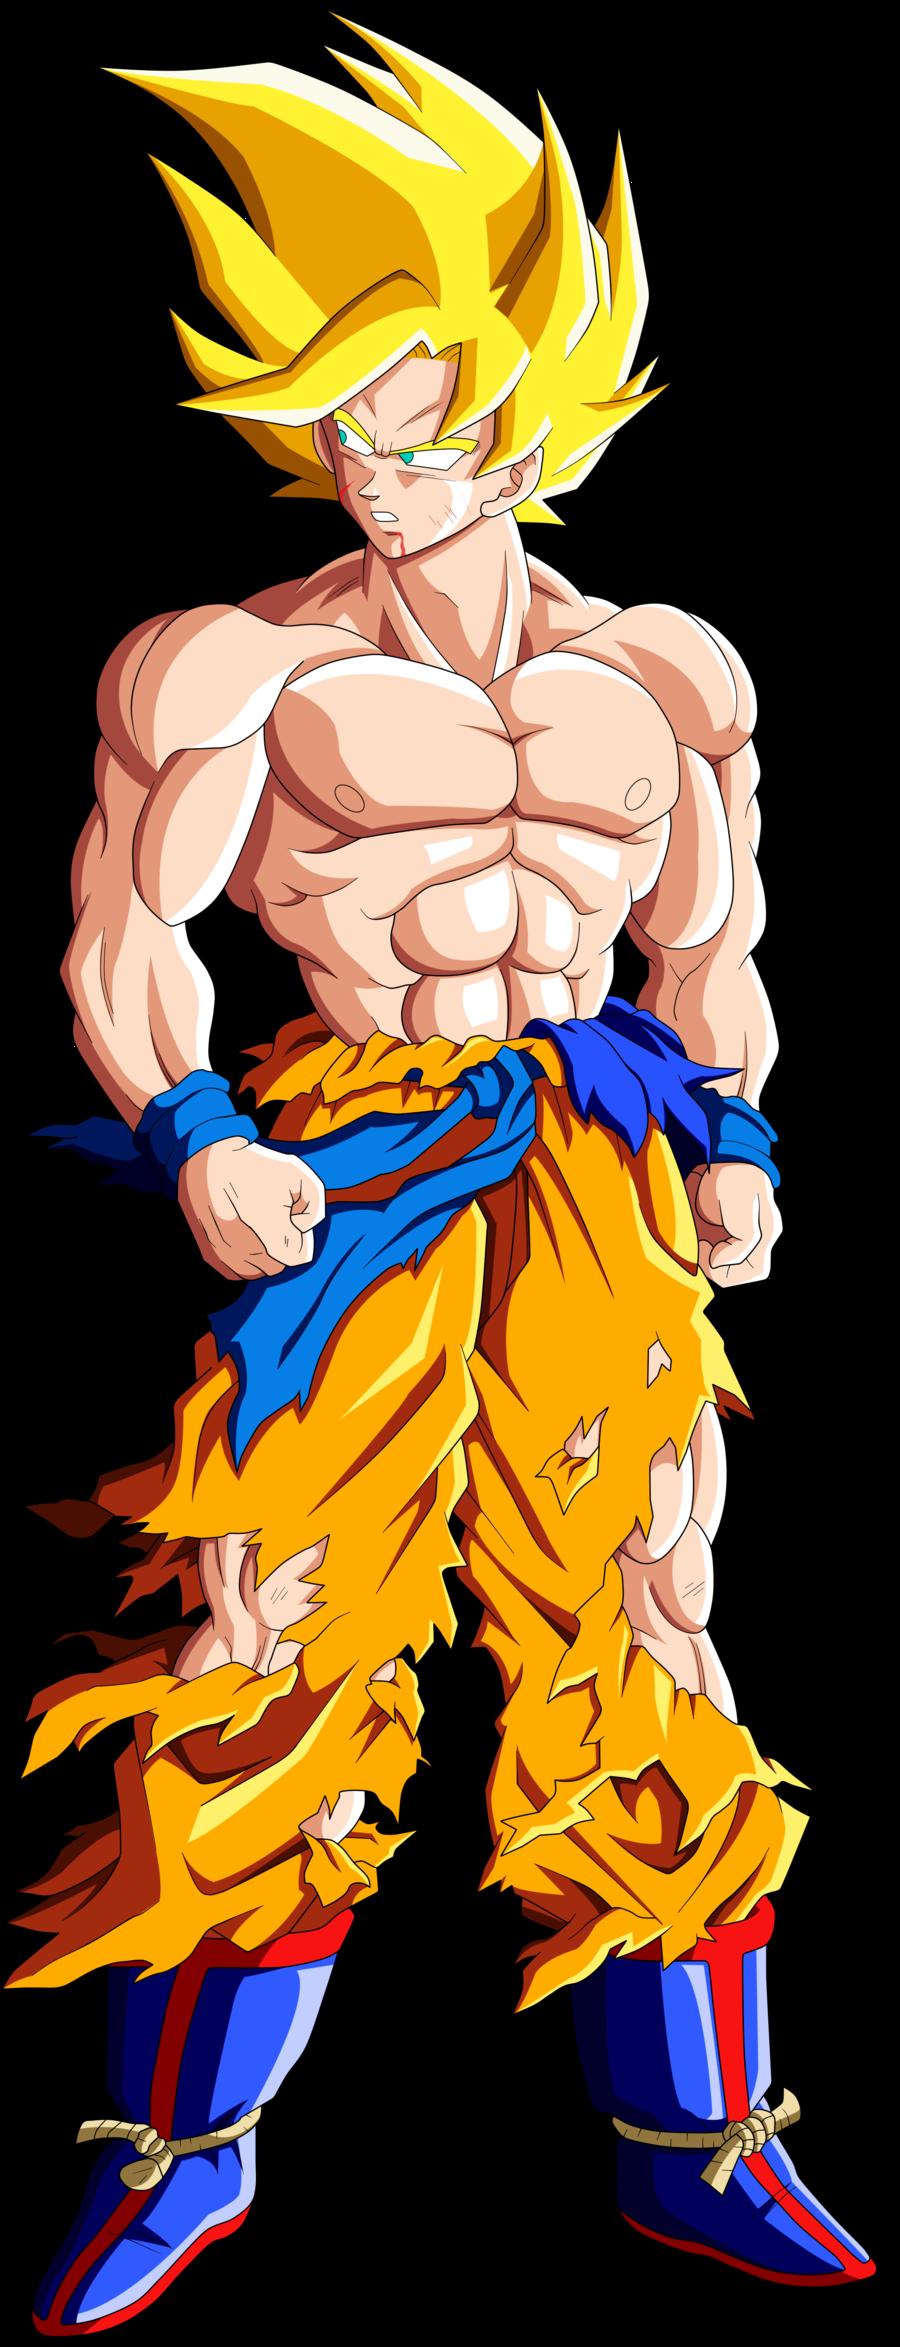 Transformaciones De Goku Anime Dragon Ball Super Dragon Ball Super Goku Dragon Ball Goku